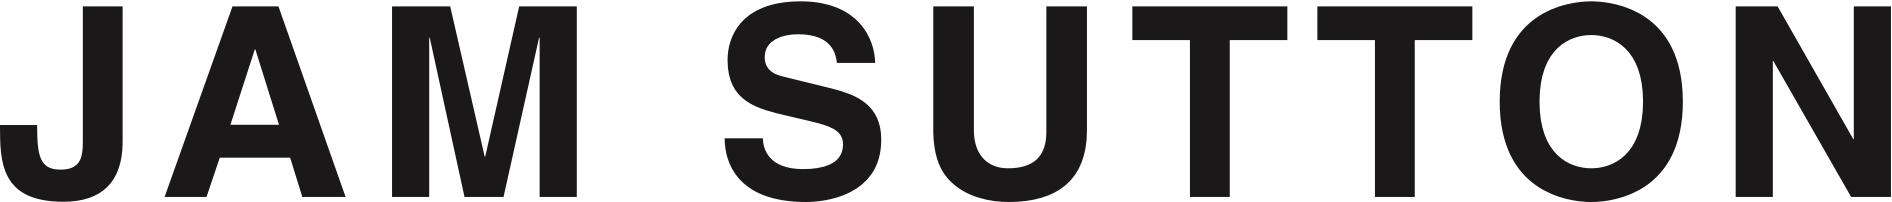 Jam Sutton logo